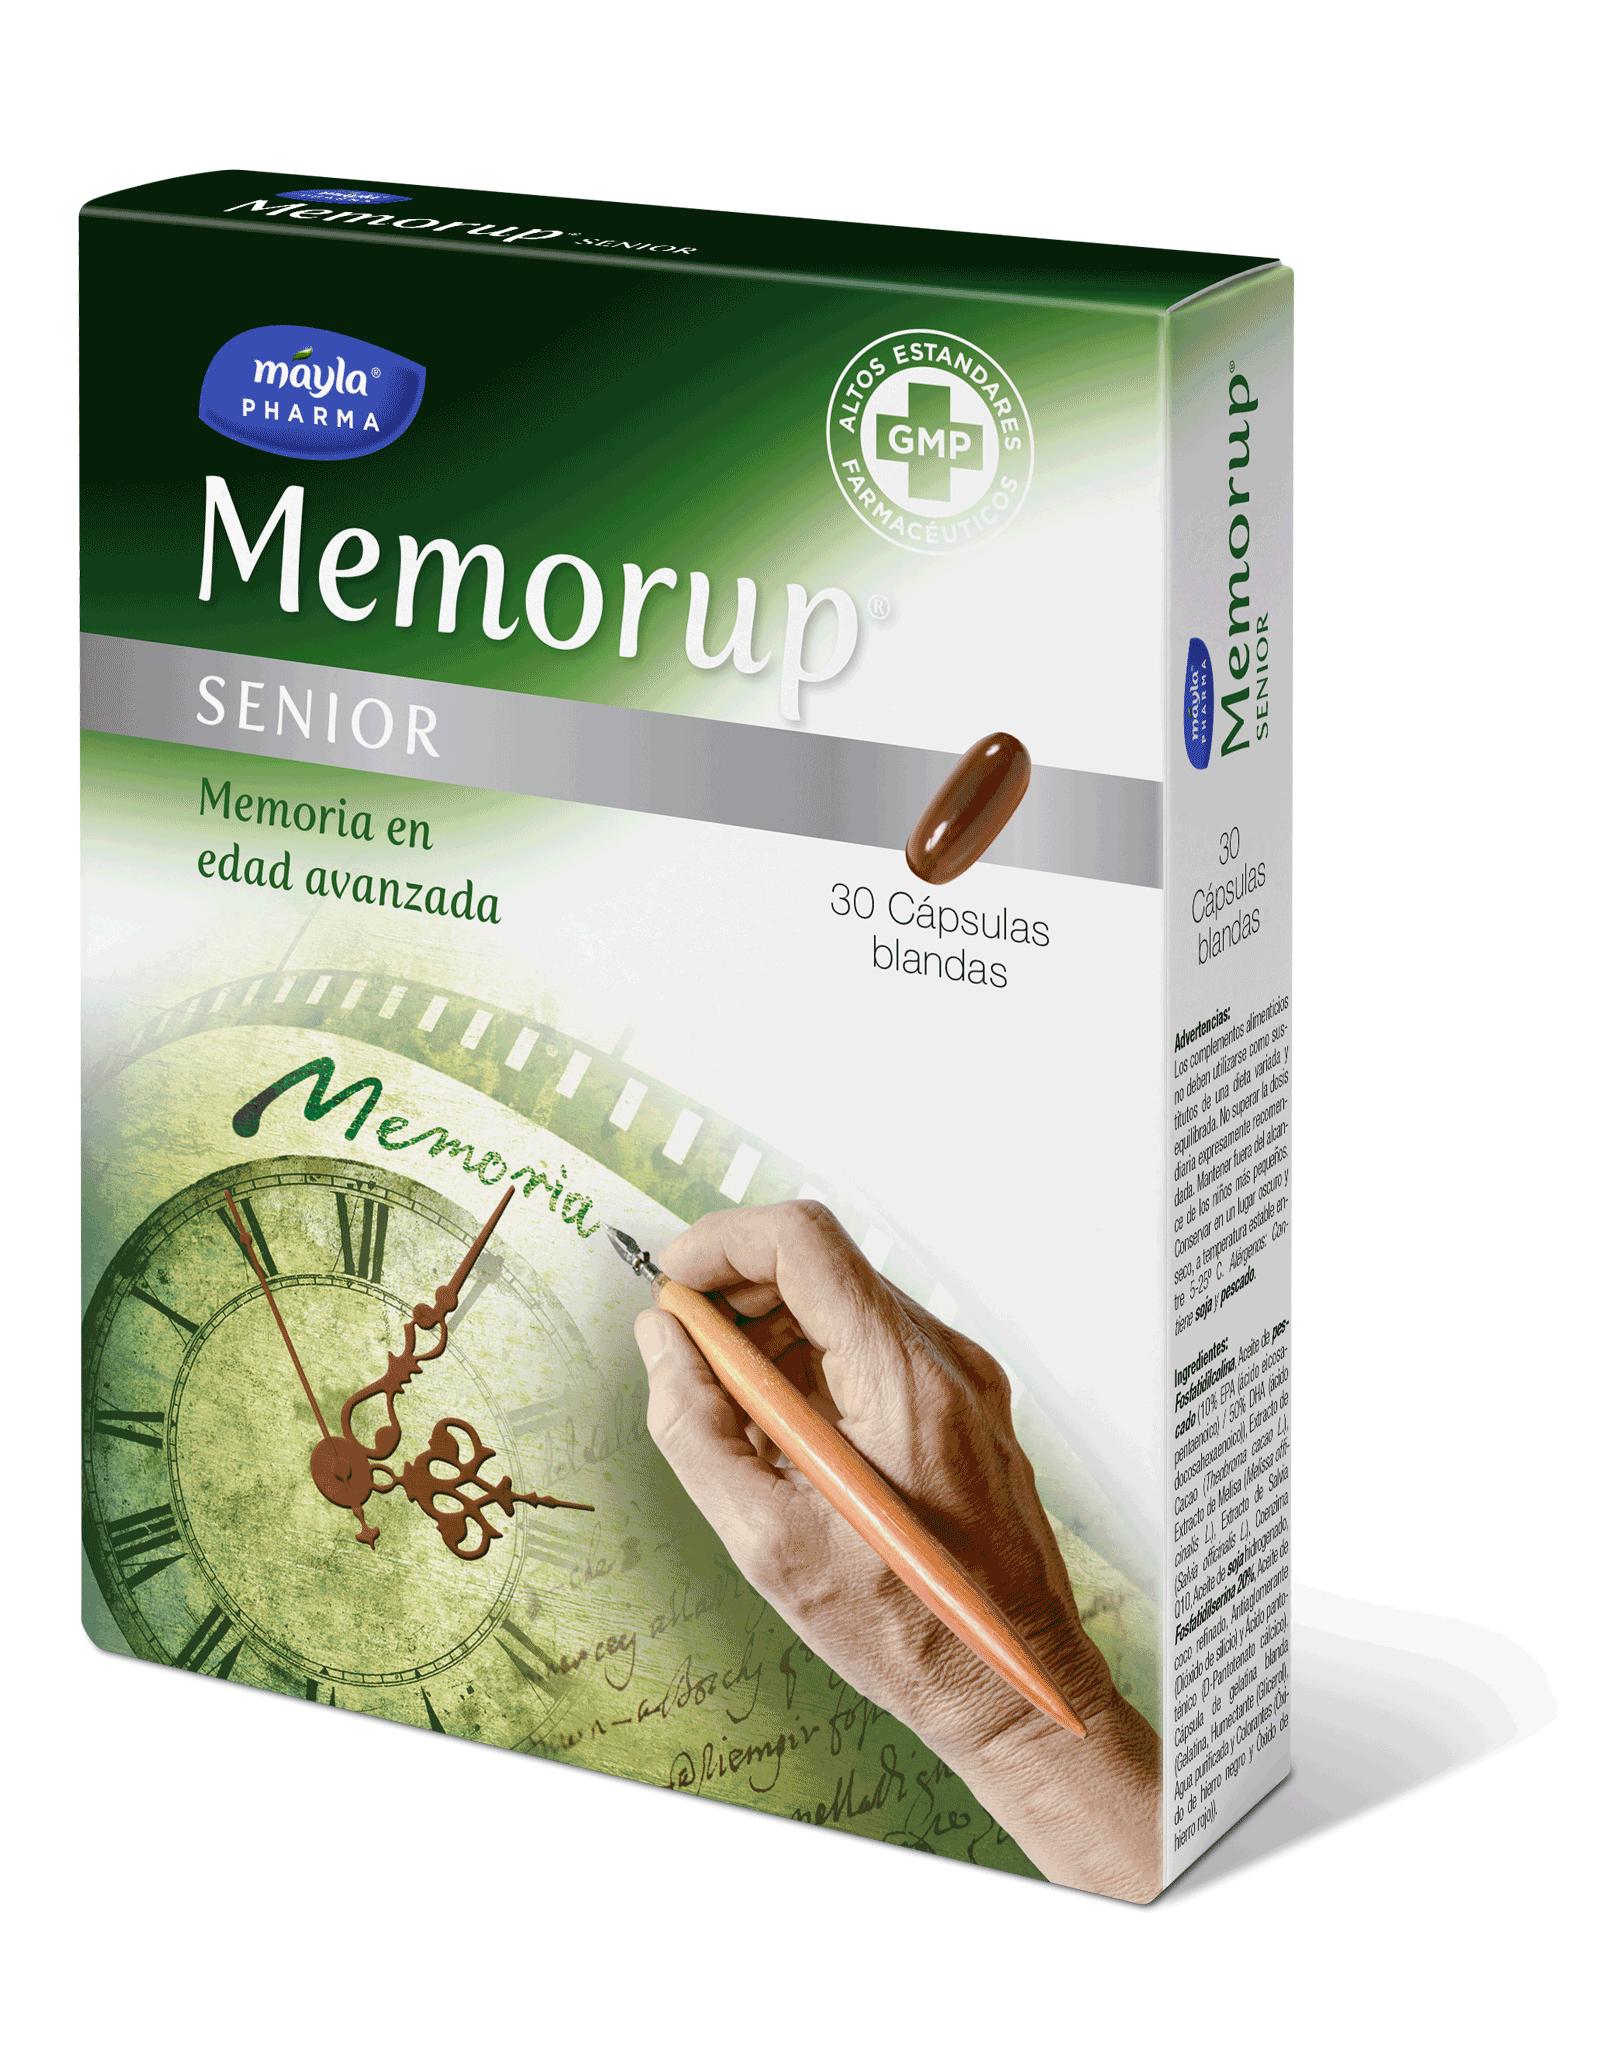 Memorup® Senior